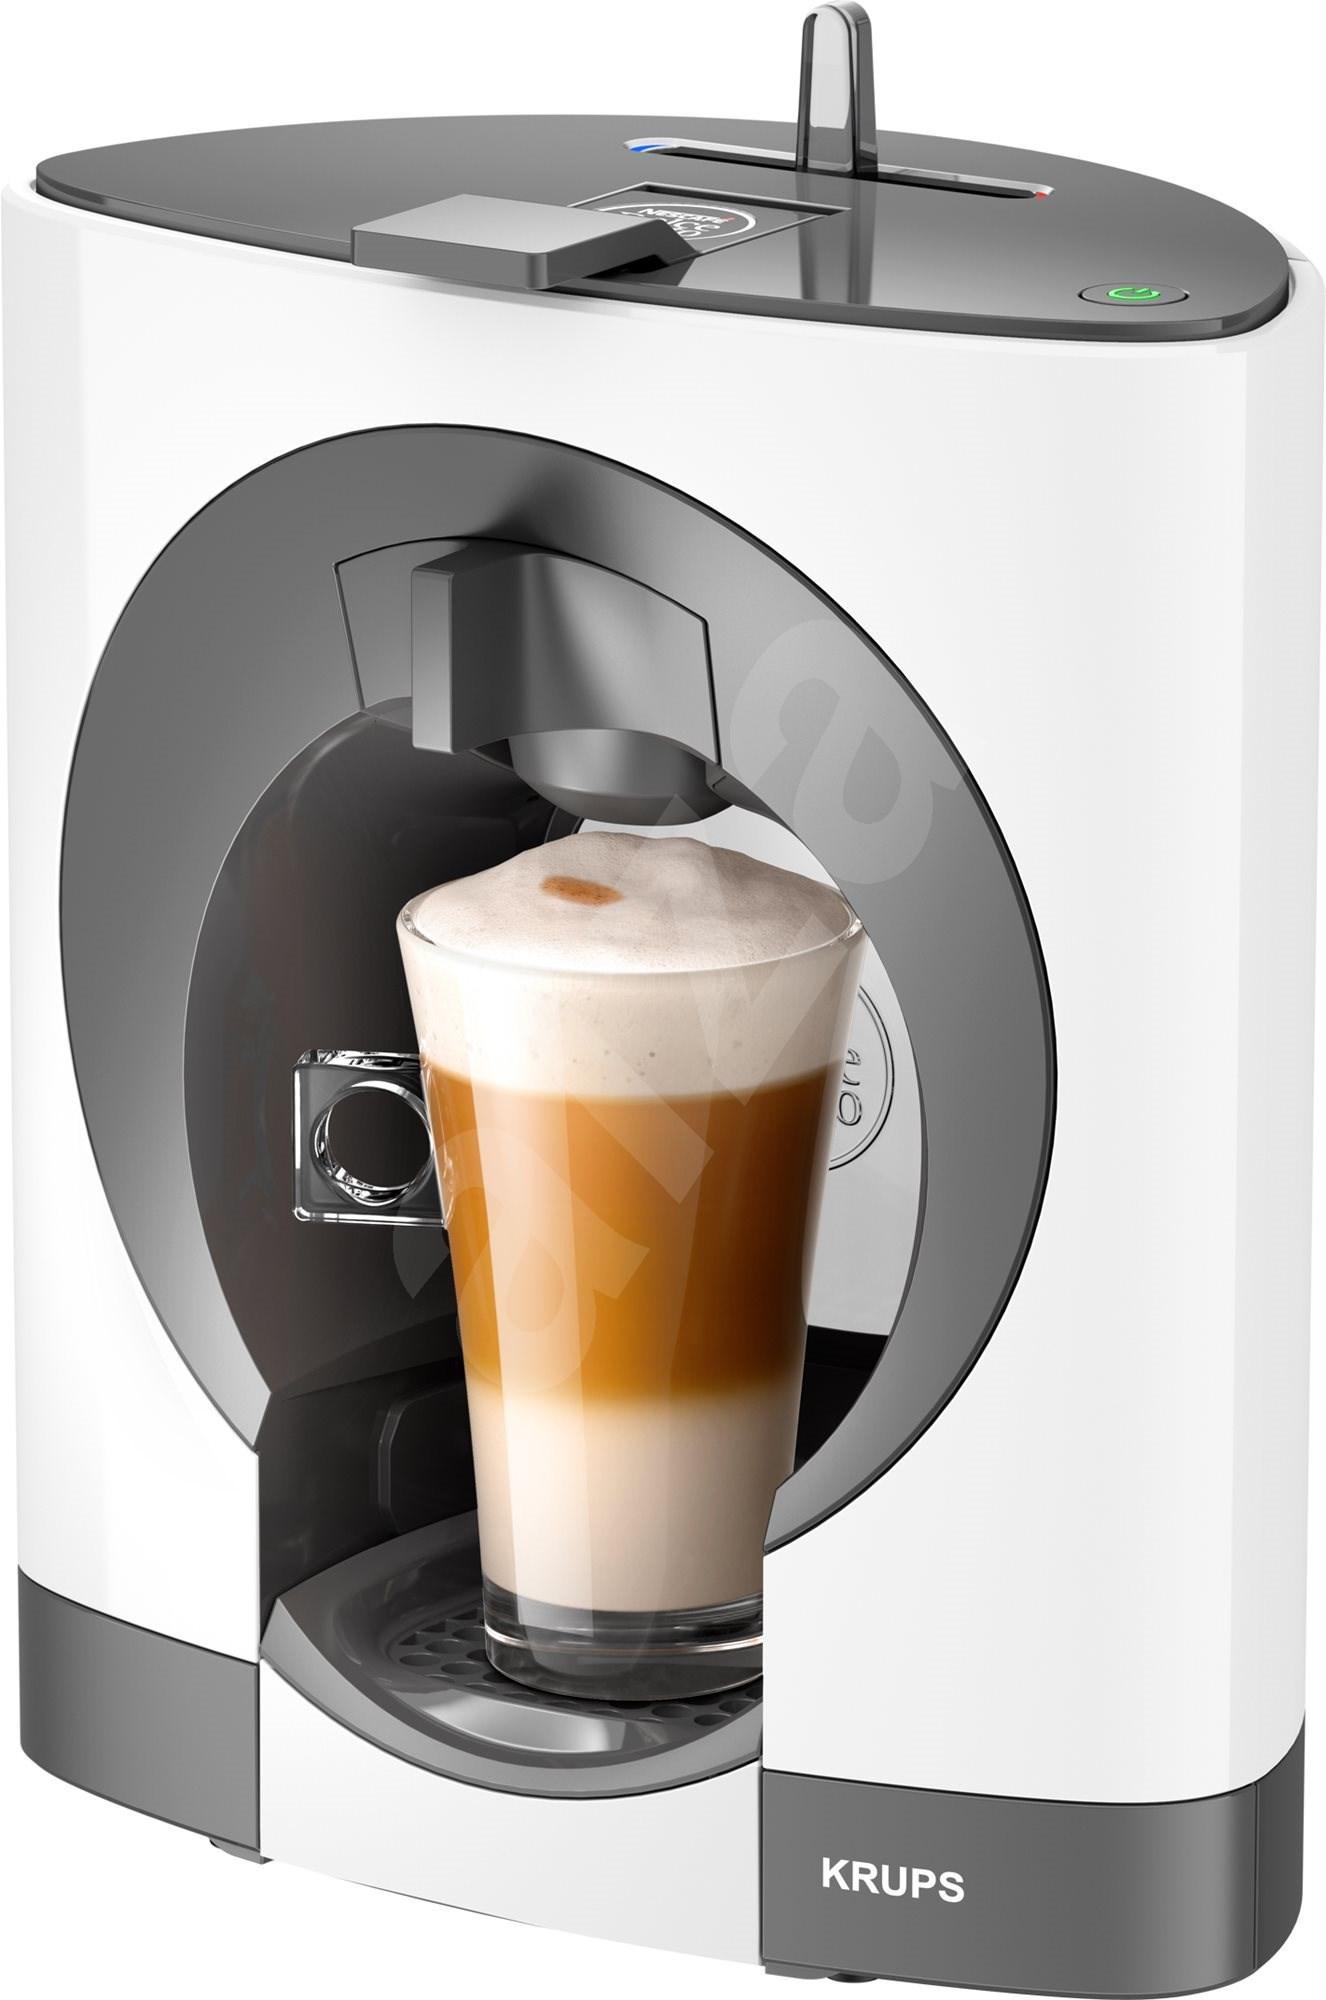 krups kp110131 nescaf dolce gusto oblo capsule coffee machine. Black Bedroom Furniture Sets. Home Design Ideas